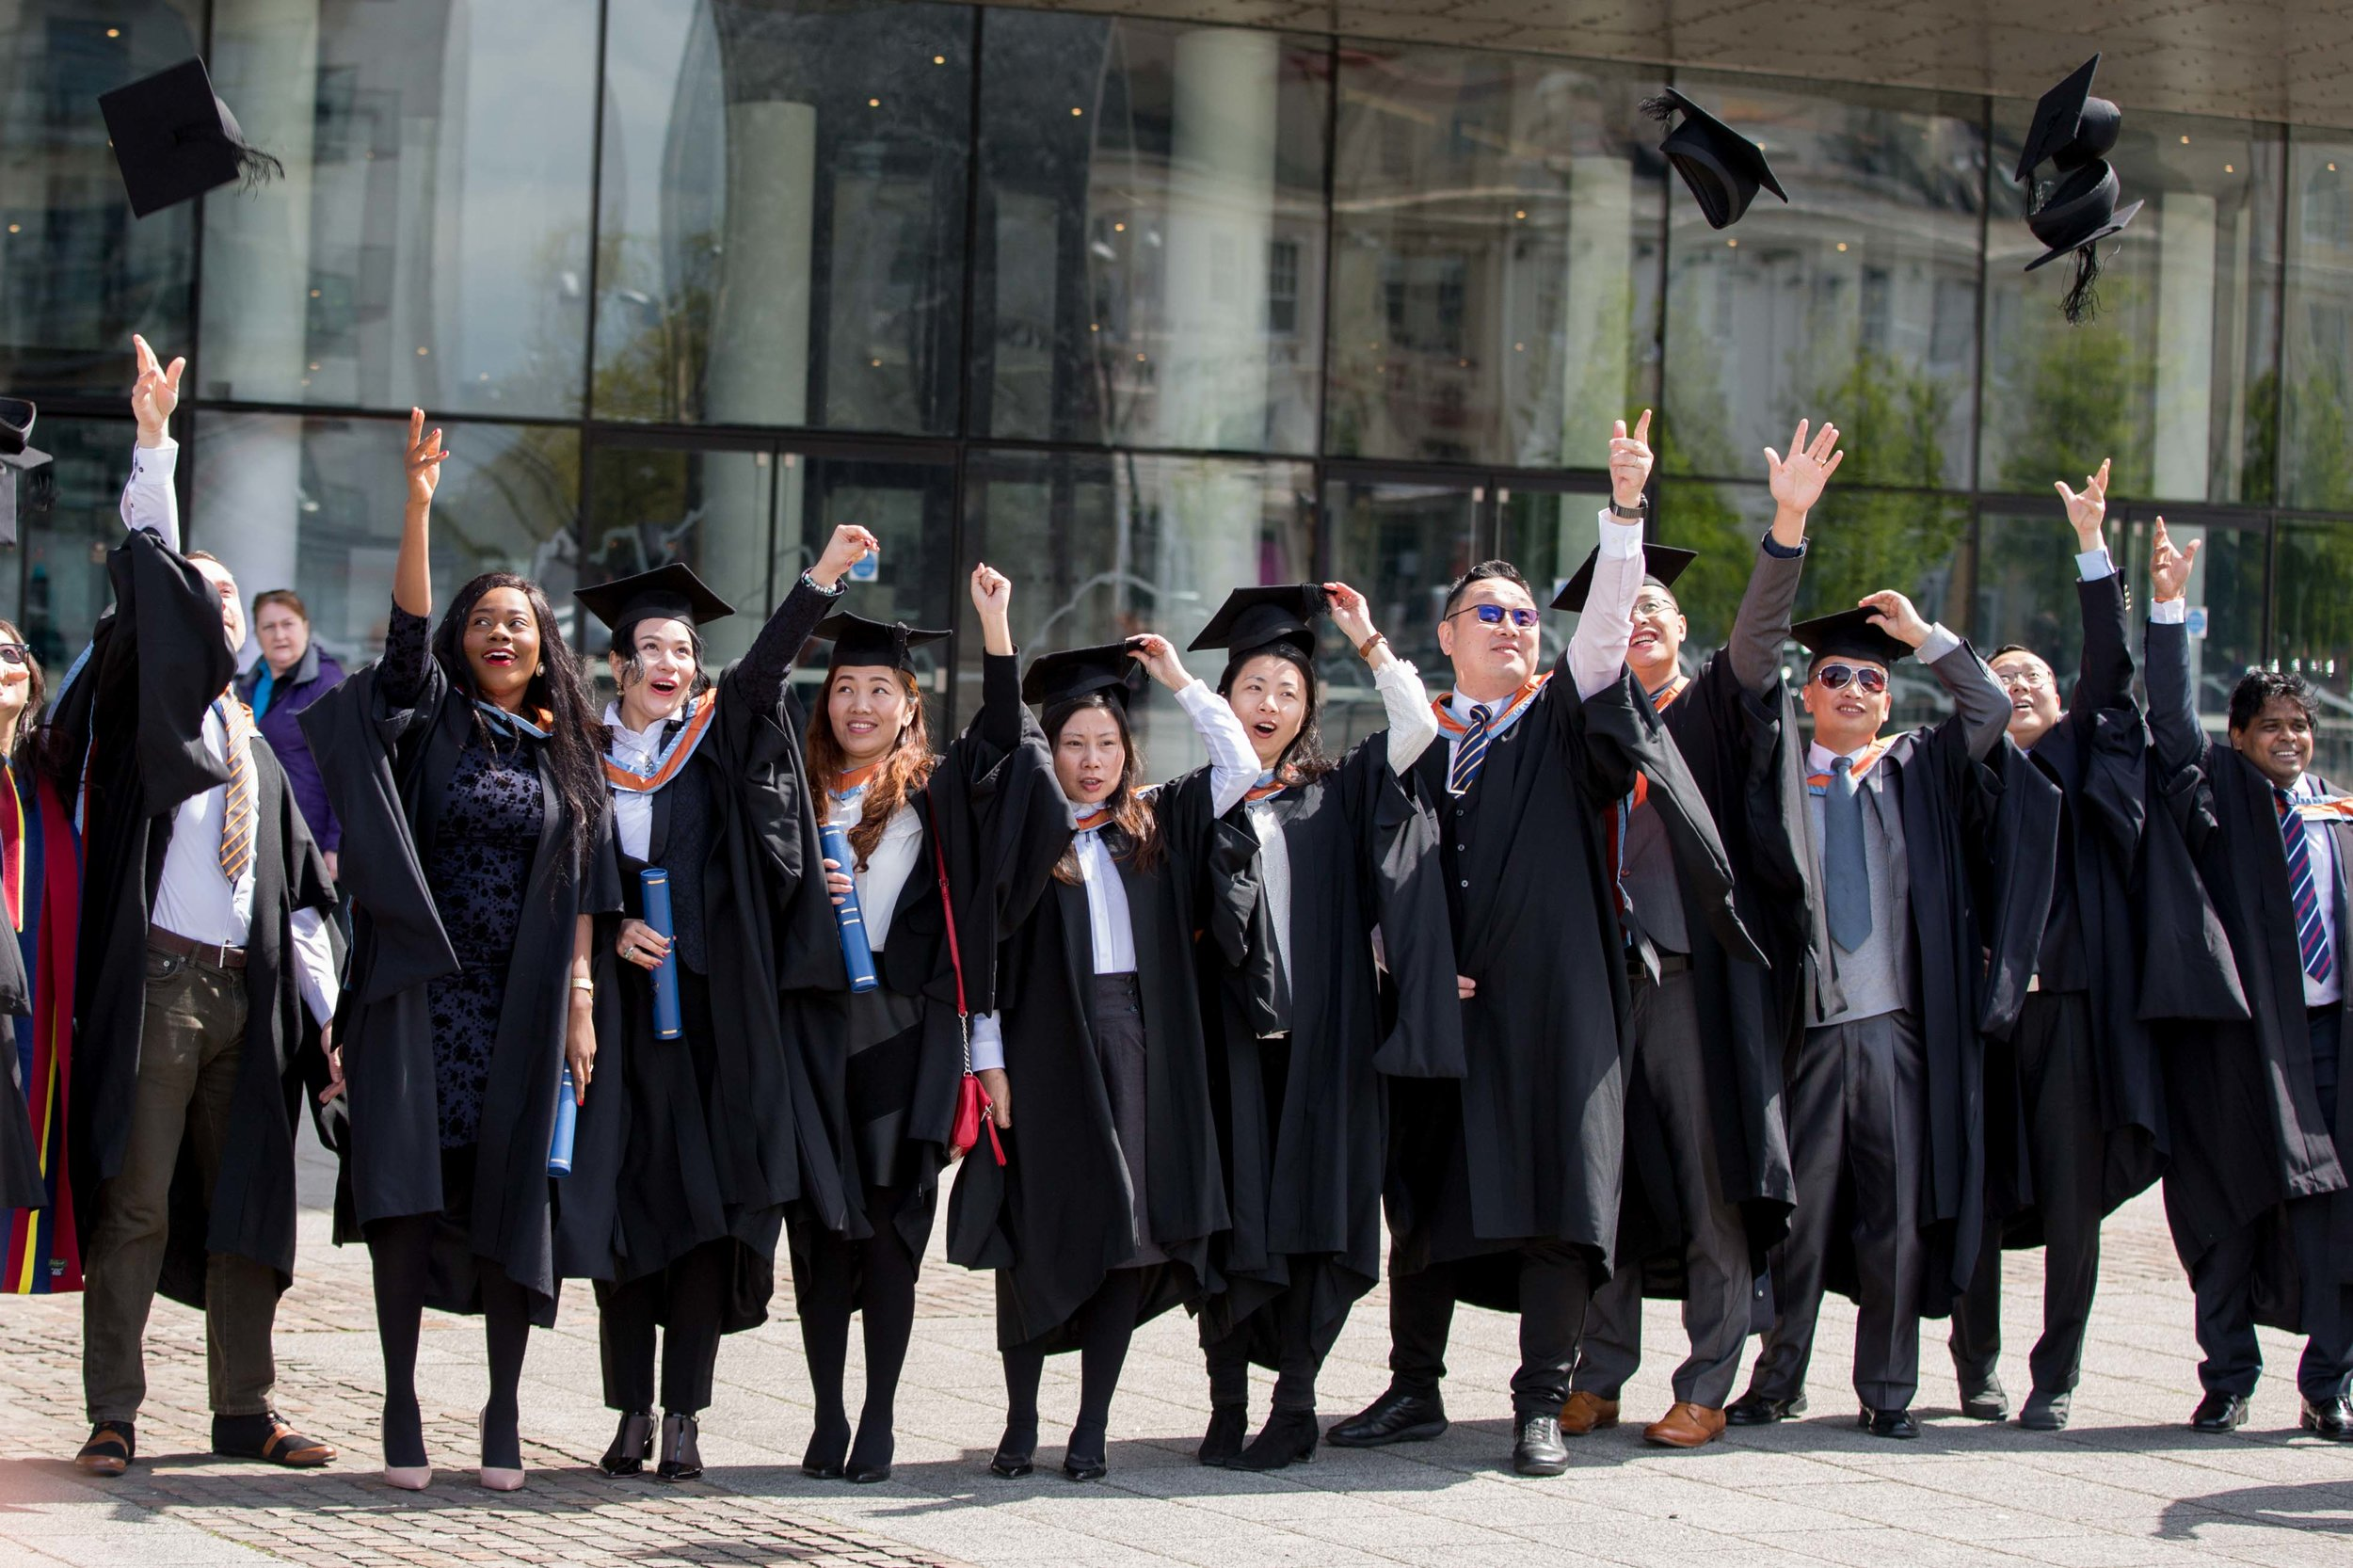 Arden-university-graduation-commercial-photographer-cardiff-natalia-smith-photography-36.jpg